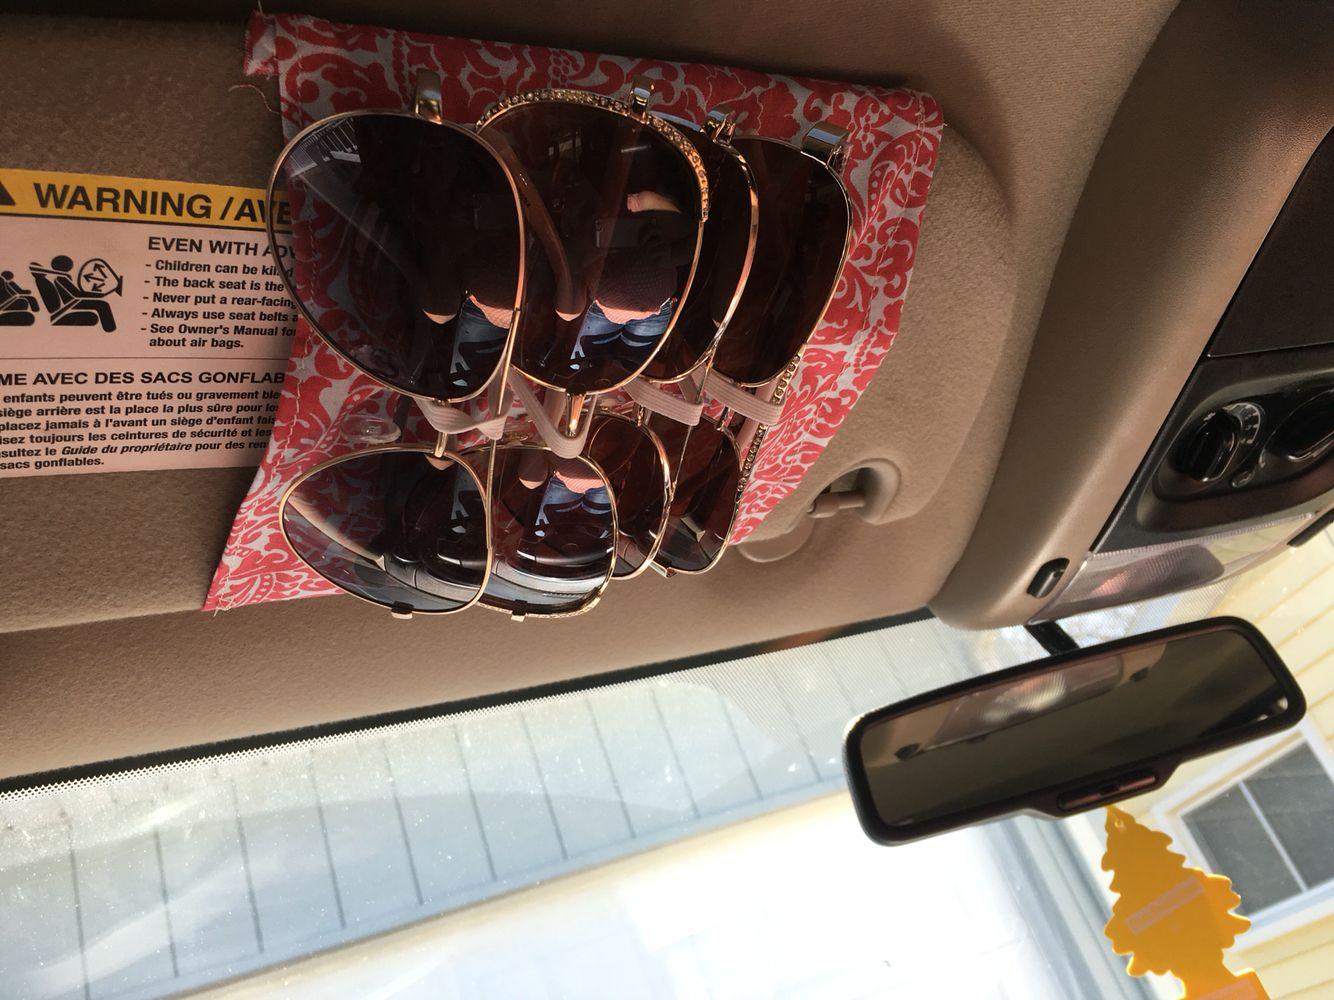 Car Suv Sun Visor Clip Sunglasses Storage Box Glasses Holder Transparent Color Watches, Parts & Accessories